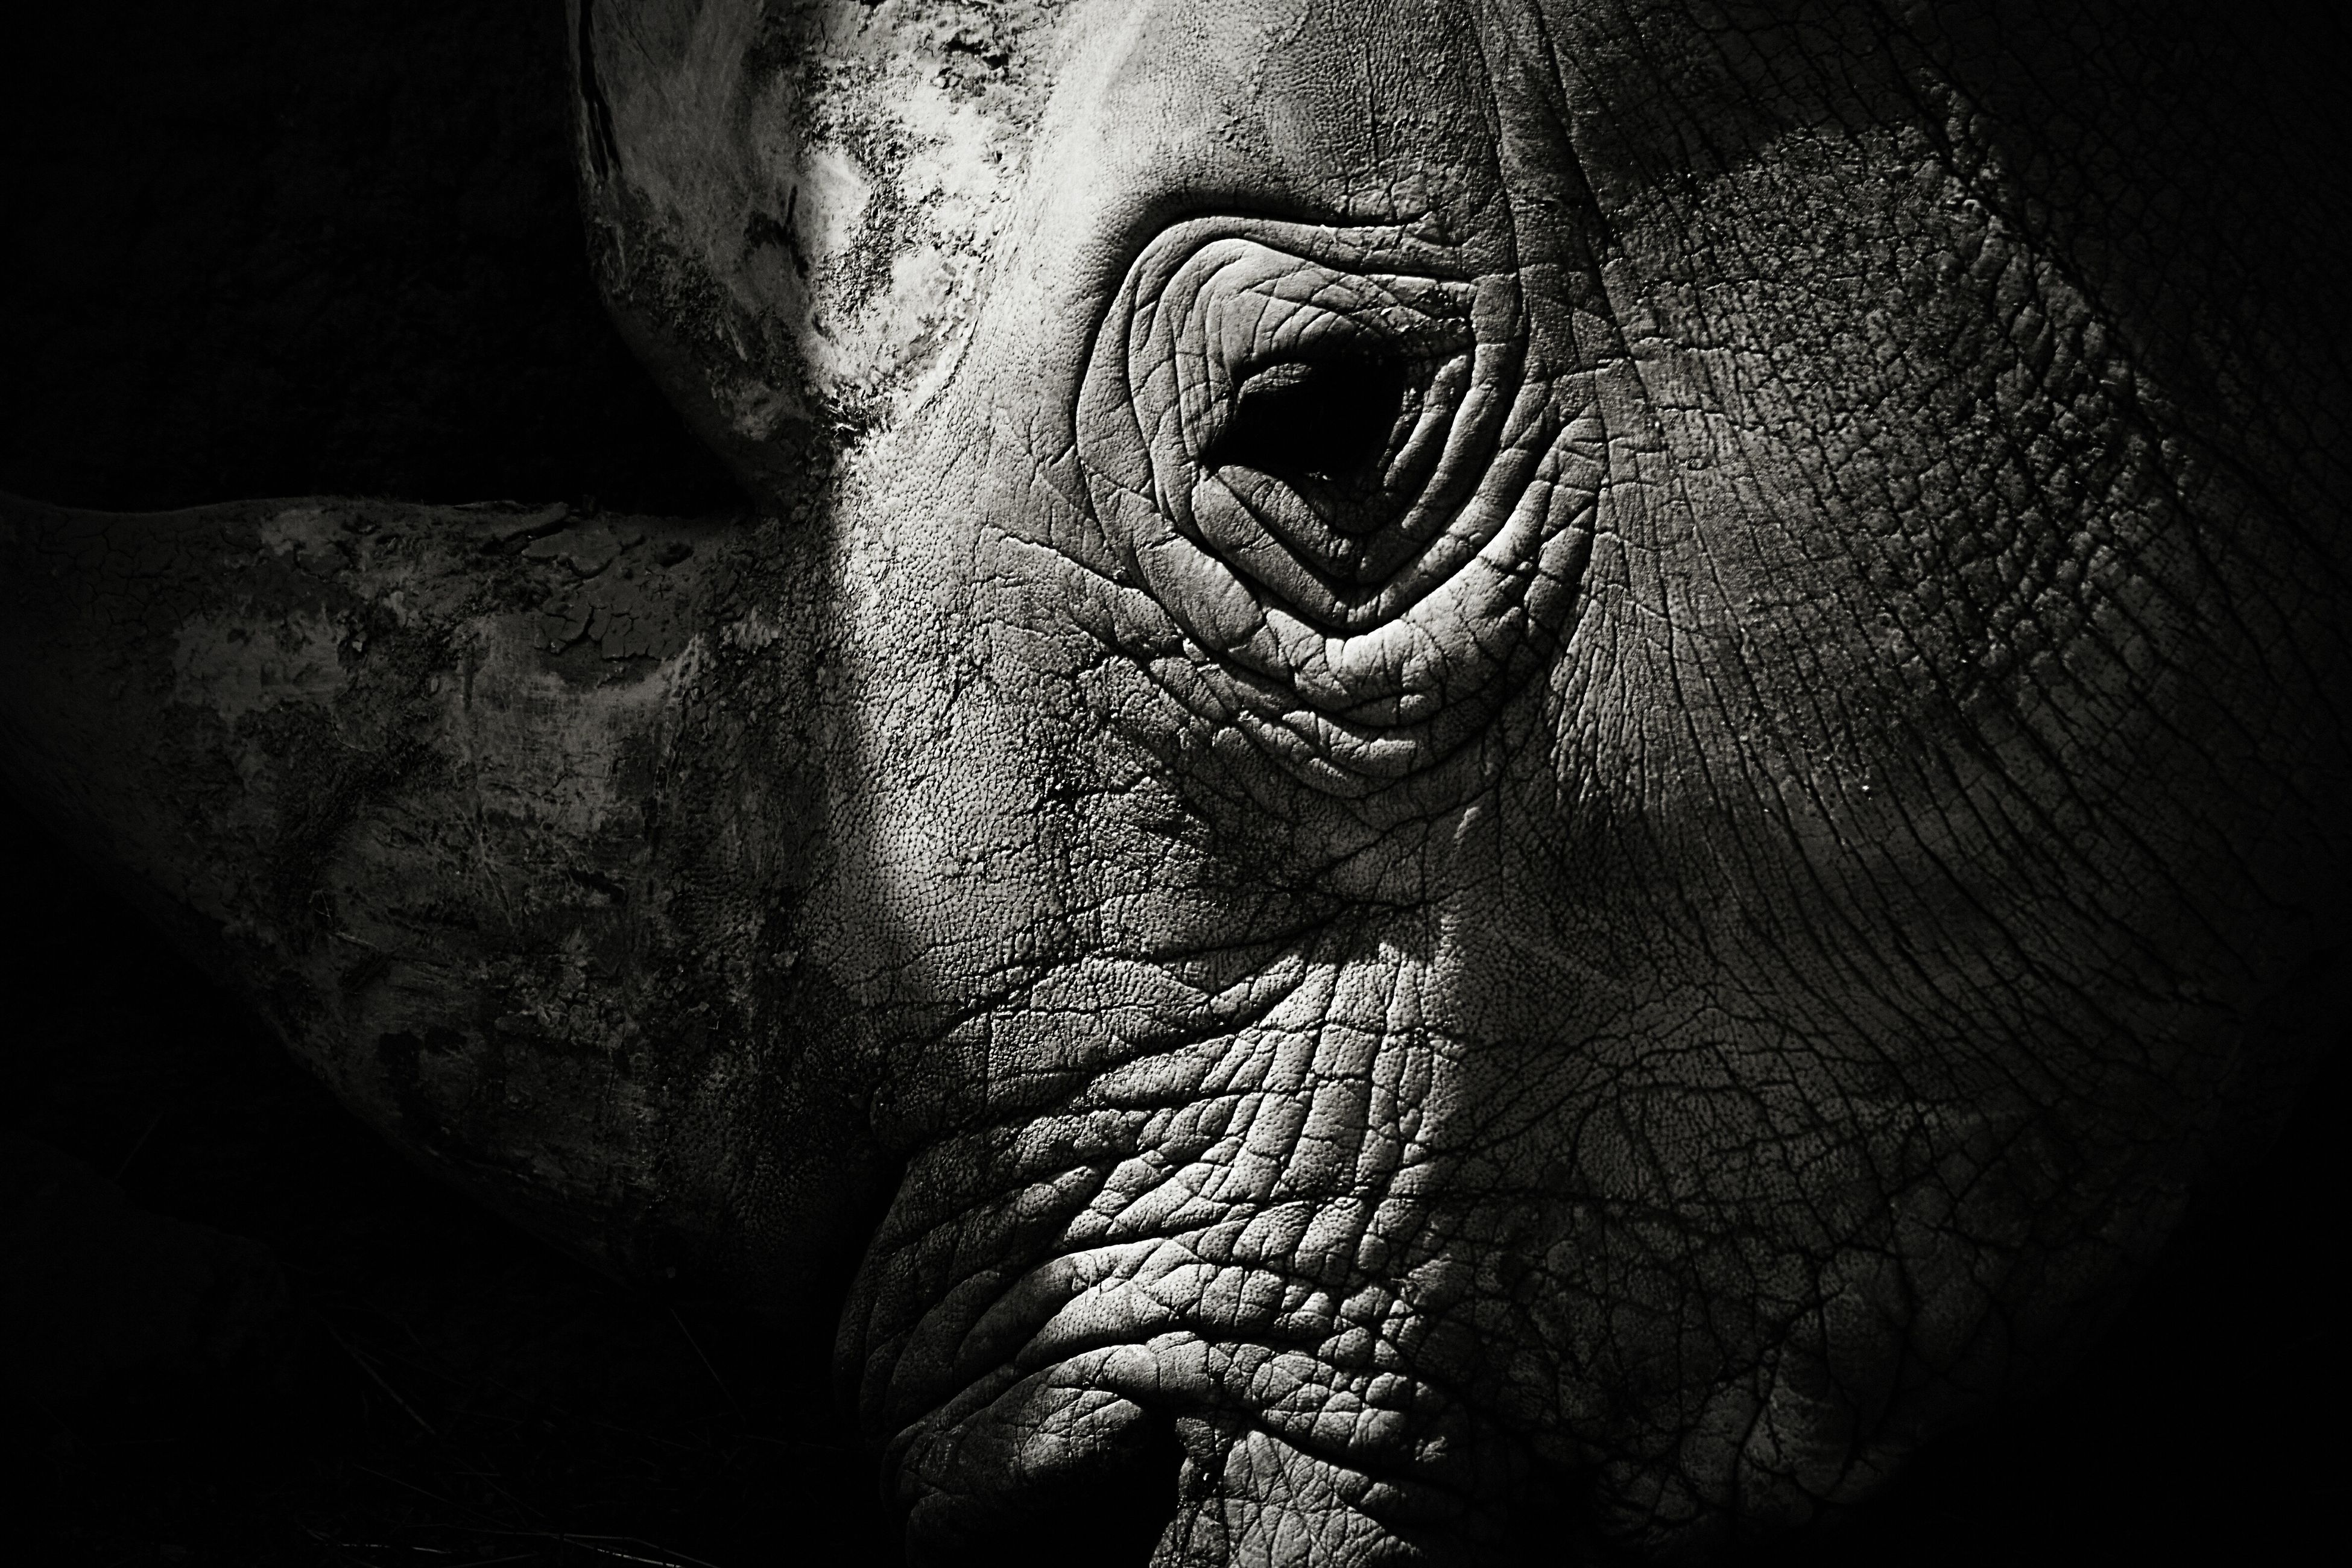 elephant, one animal, animals in the wild, animal wildlife, animal themes, mammal, animal trunk, no people, rhinoceros, outdoors, day, close-up, safari animals, african elephant, nature, tusk